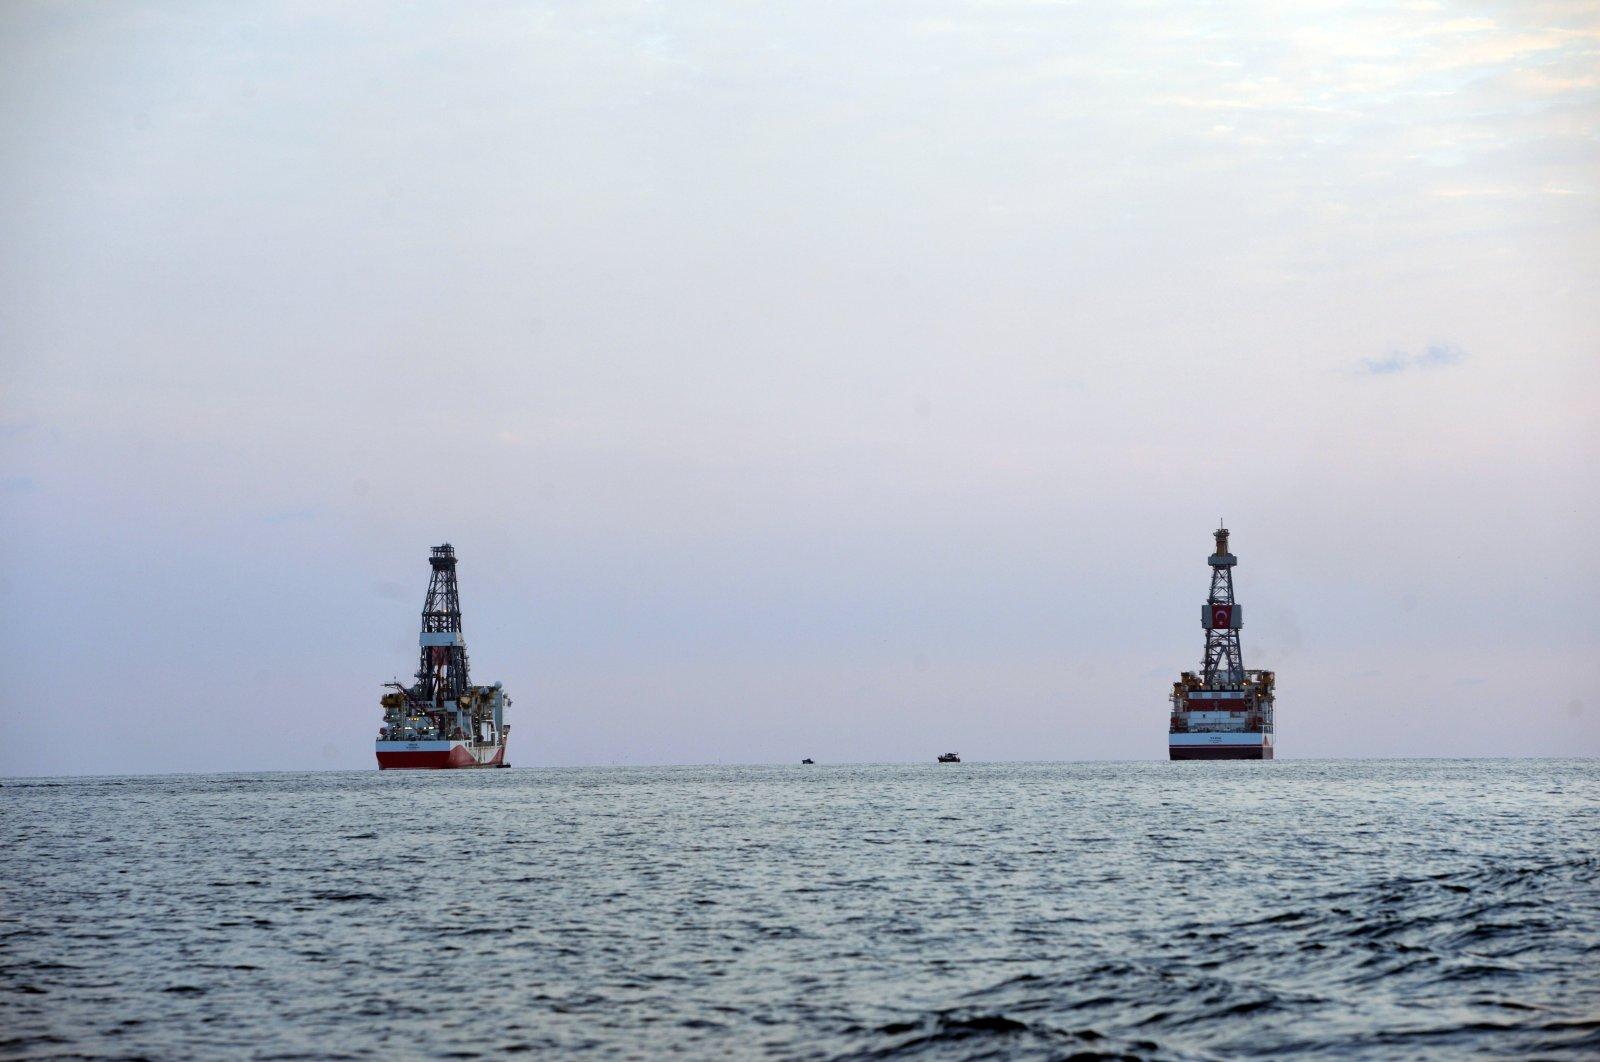 Turkey's Kanuni (R) and Yavuz drilling ships arrive at Taşucu Port in Mersin, southern Turkey, Oct. 13, 2020. (AA Photo)